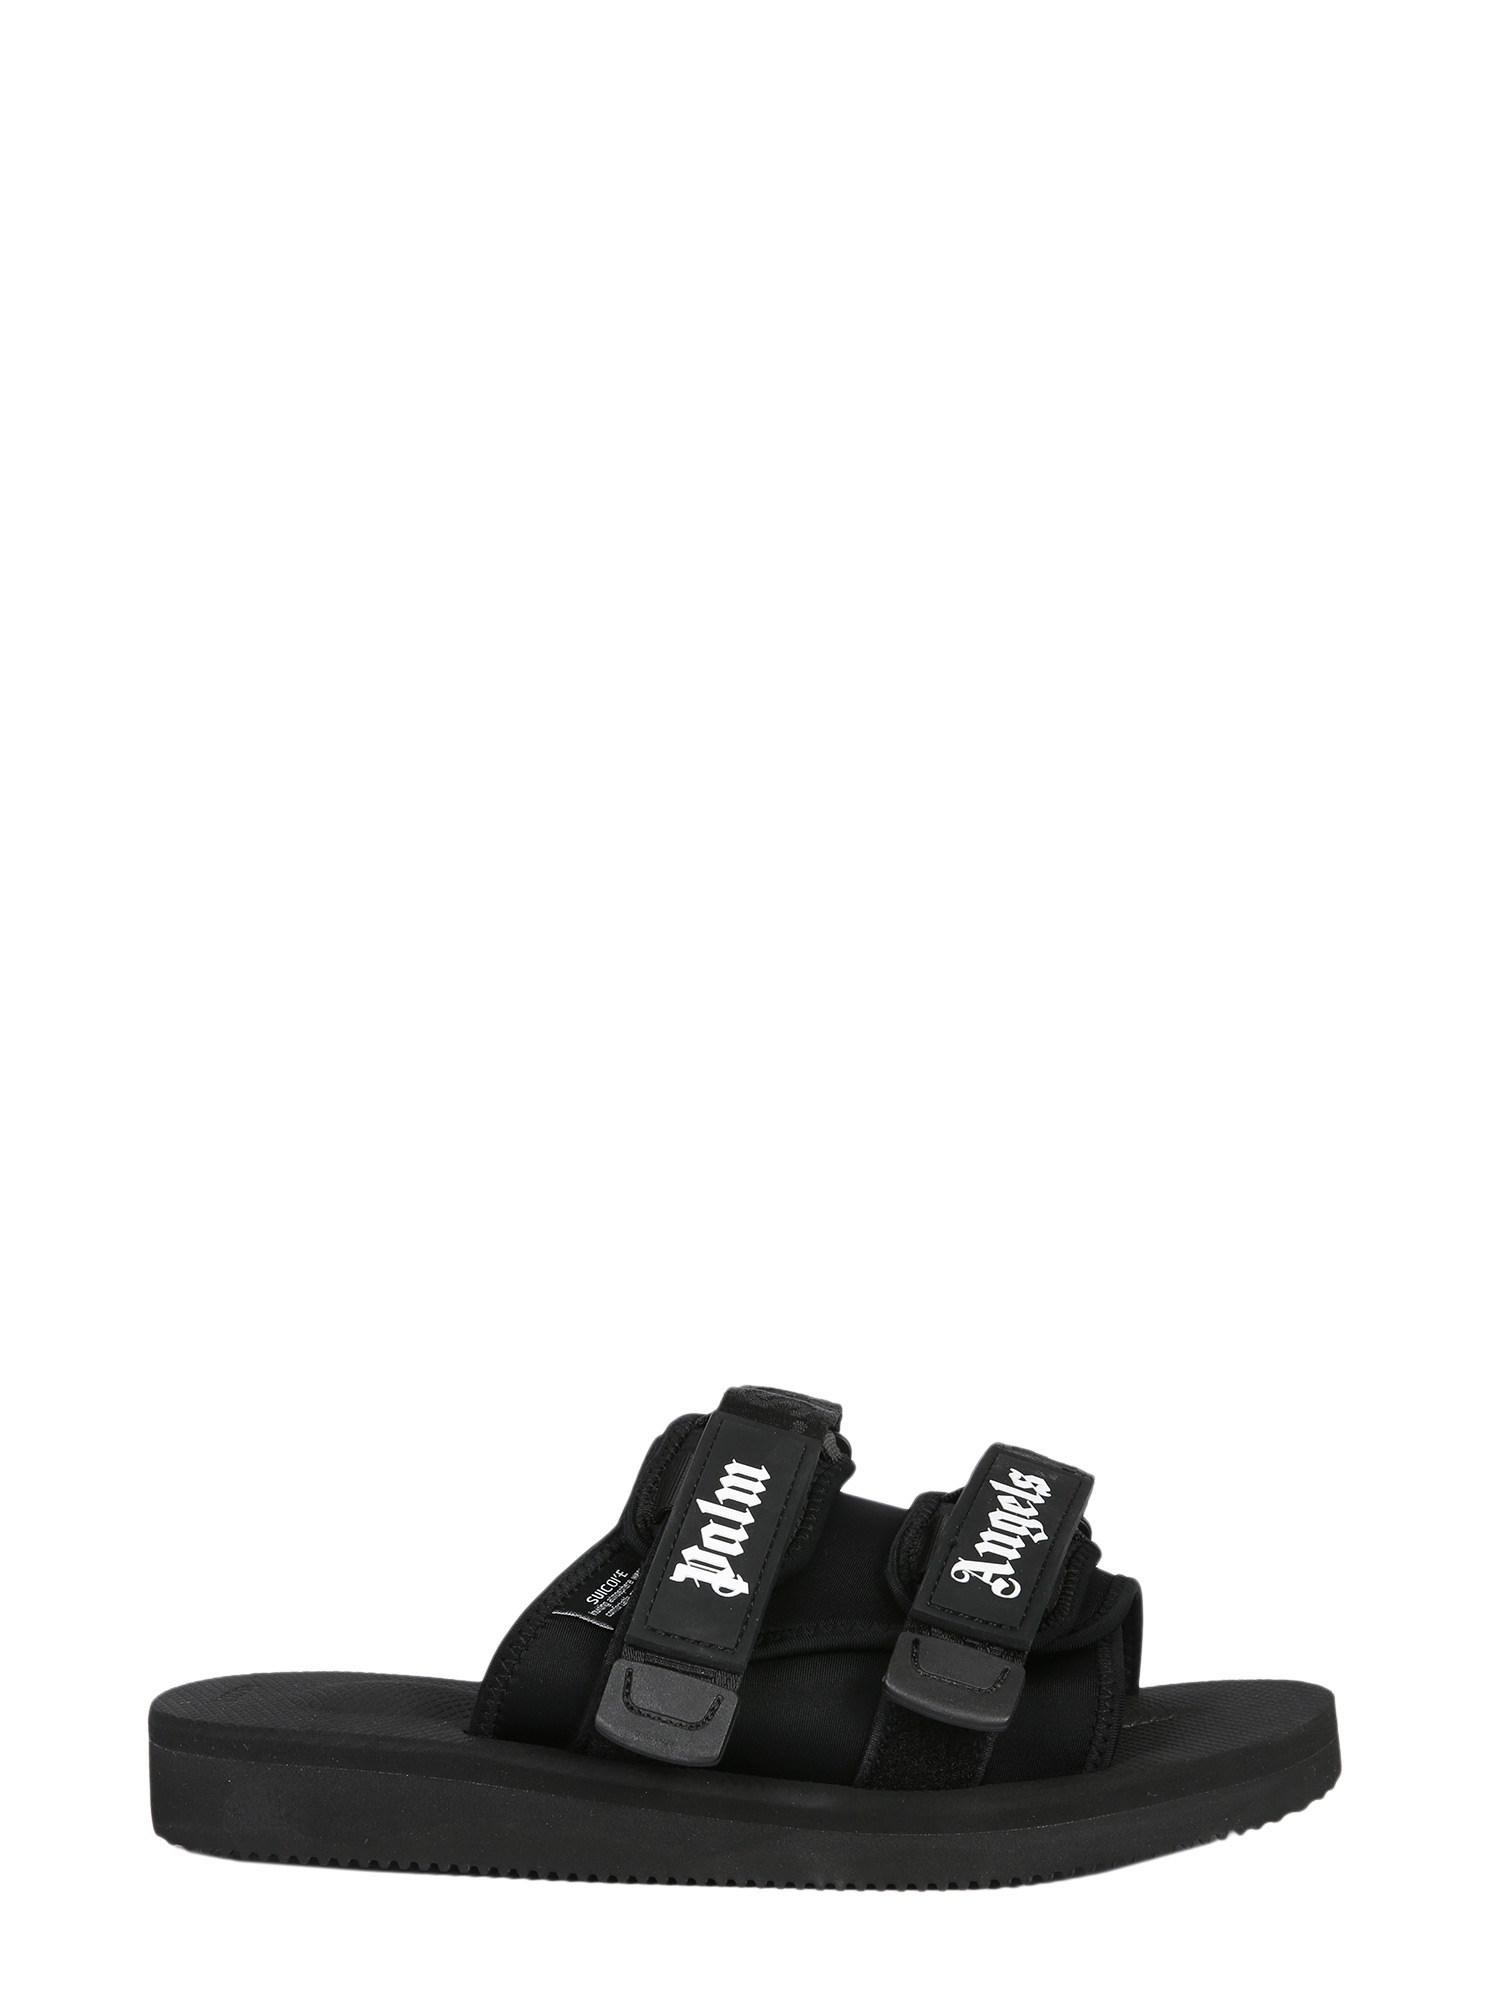 33d310885460 Palm Angels - Black Suicoke Sandals In Neoprene for Men - Lyst. View  fullscreen